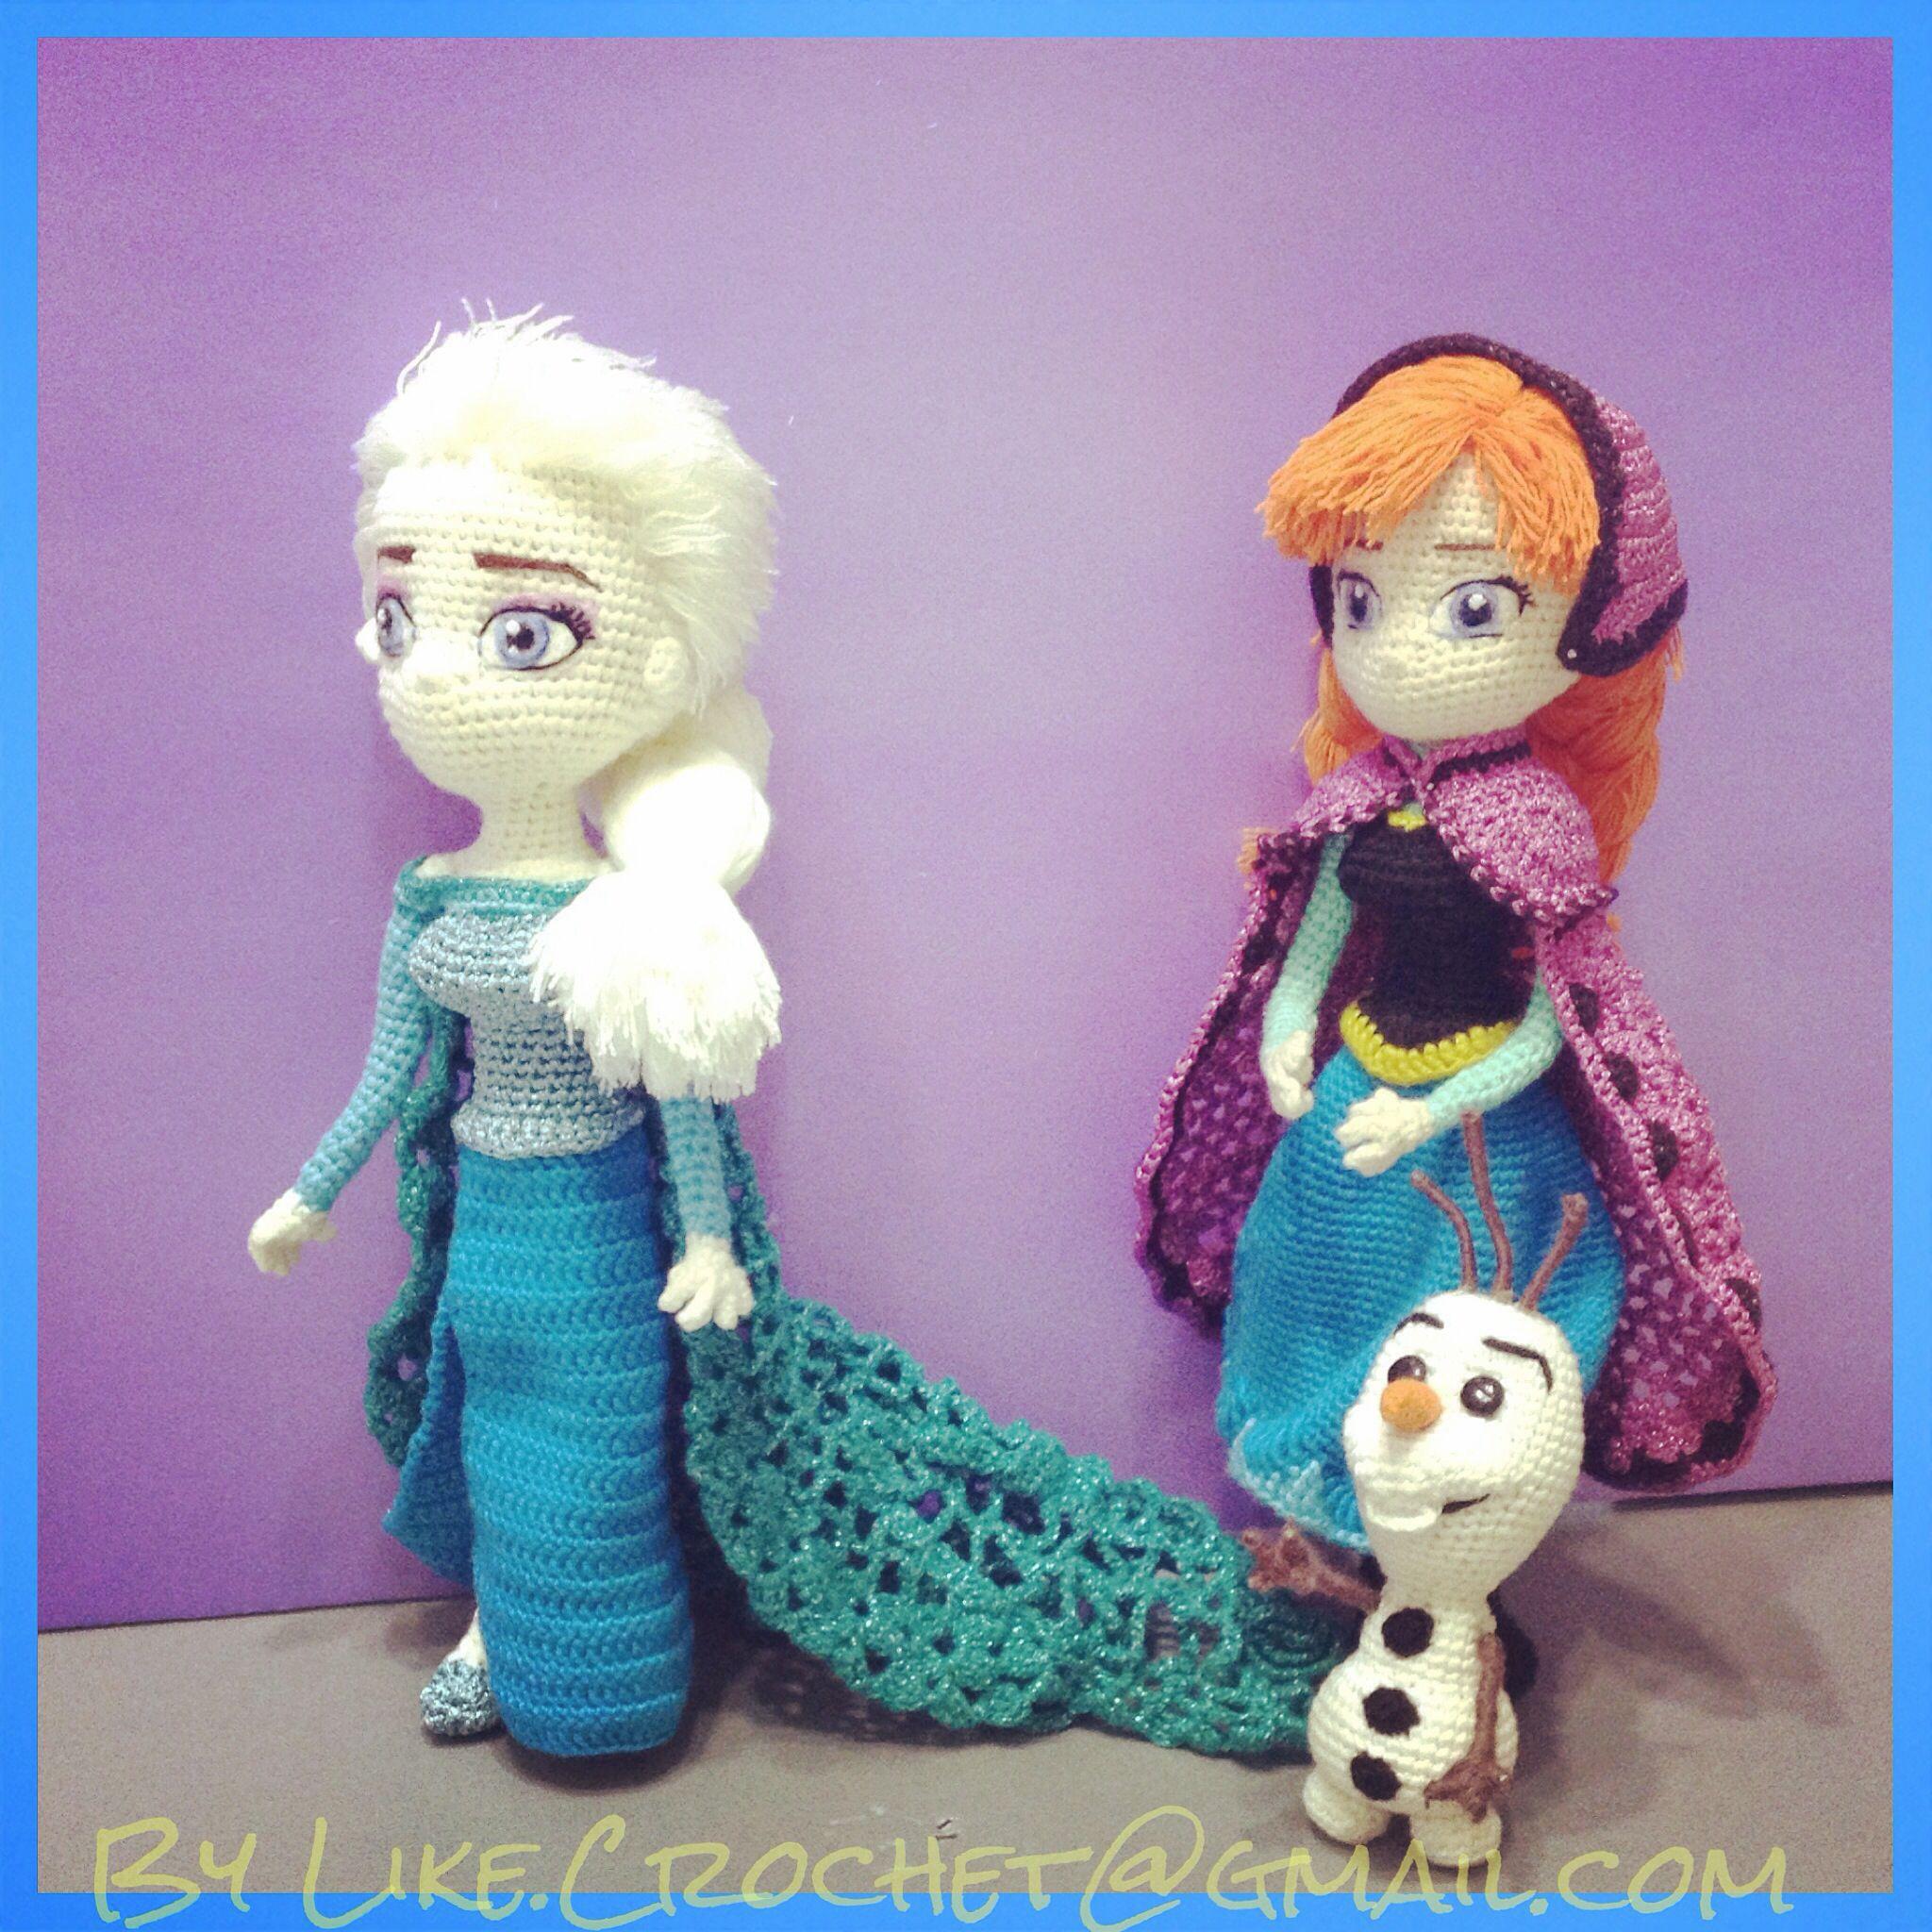 Elsa, Anna, Olaf meet at North Mountain, Frozen Disney amigurumi crocheted dolls pattern